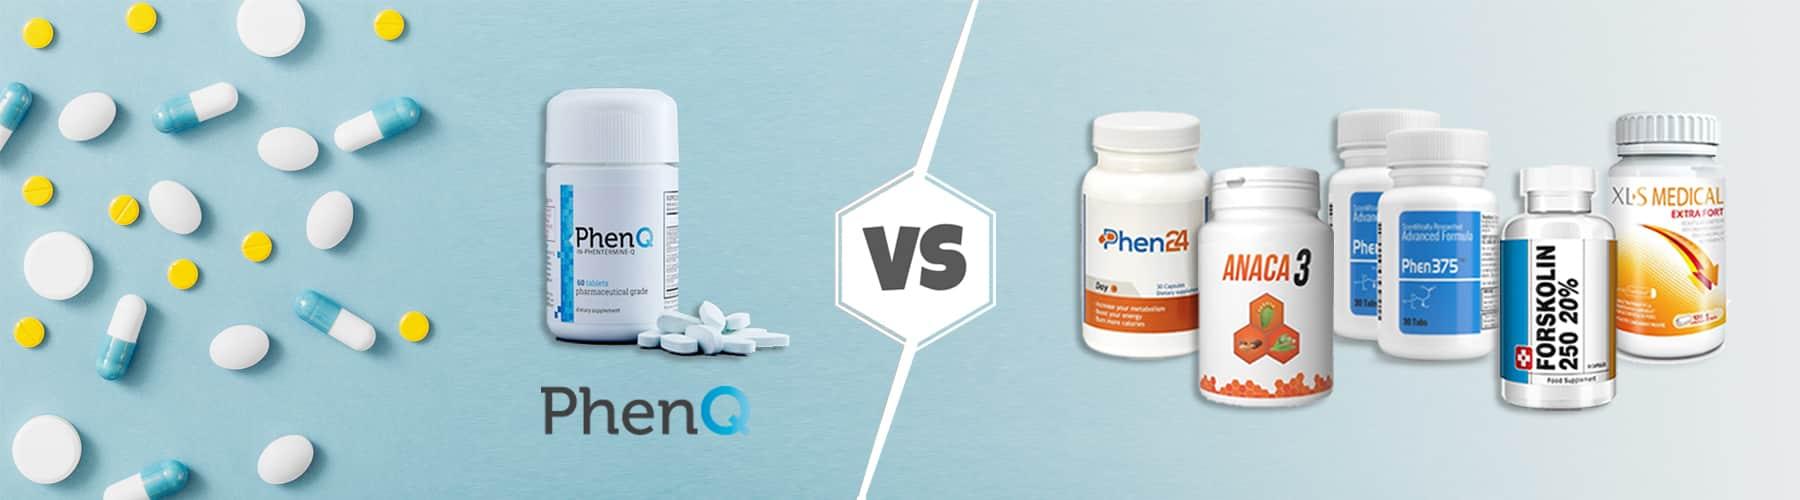 phenq-vs-anaca3-vsphen24-forskolin